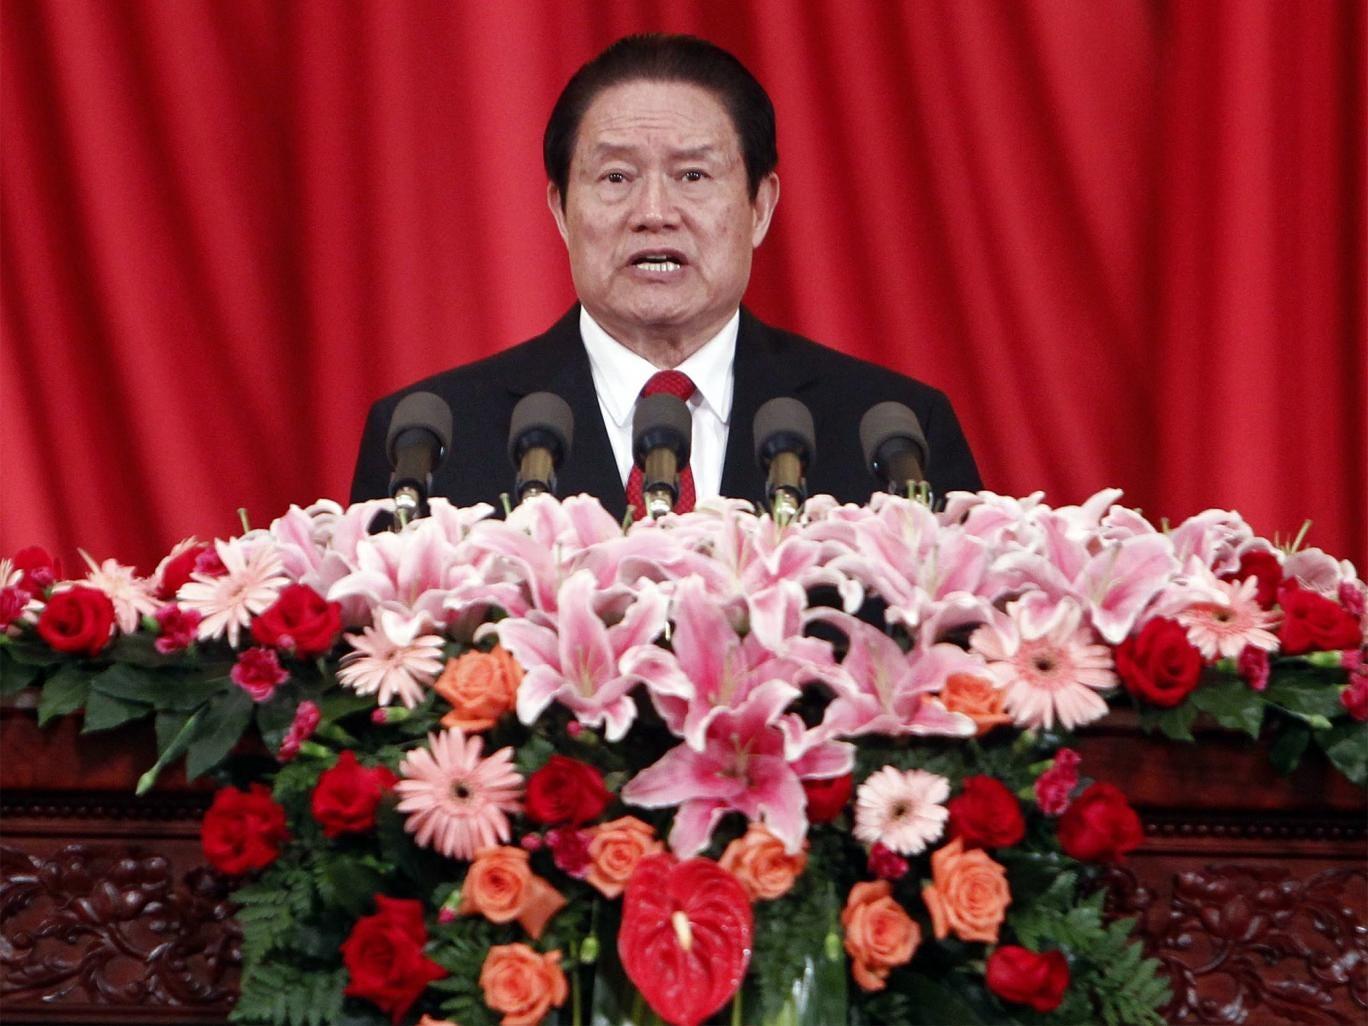 Zhou Yongkang making a speech in Beijing in 2012, when he was still a Politburo standing committee member